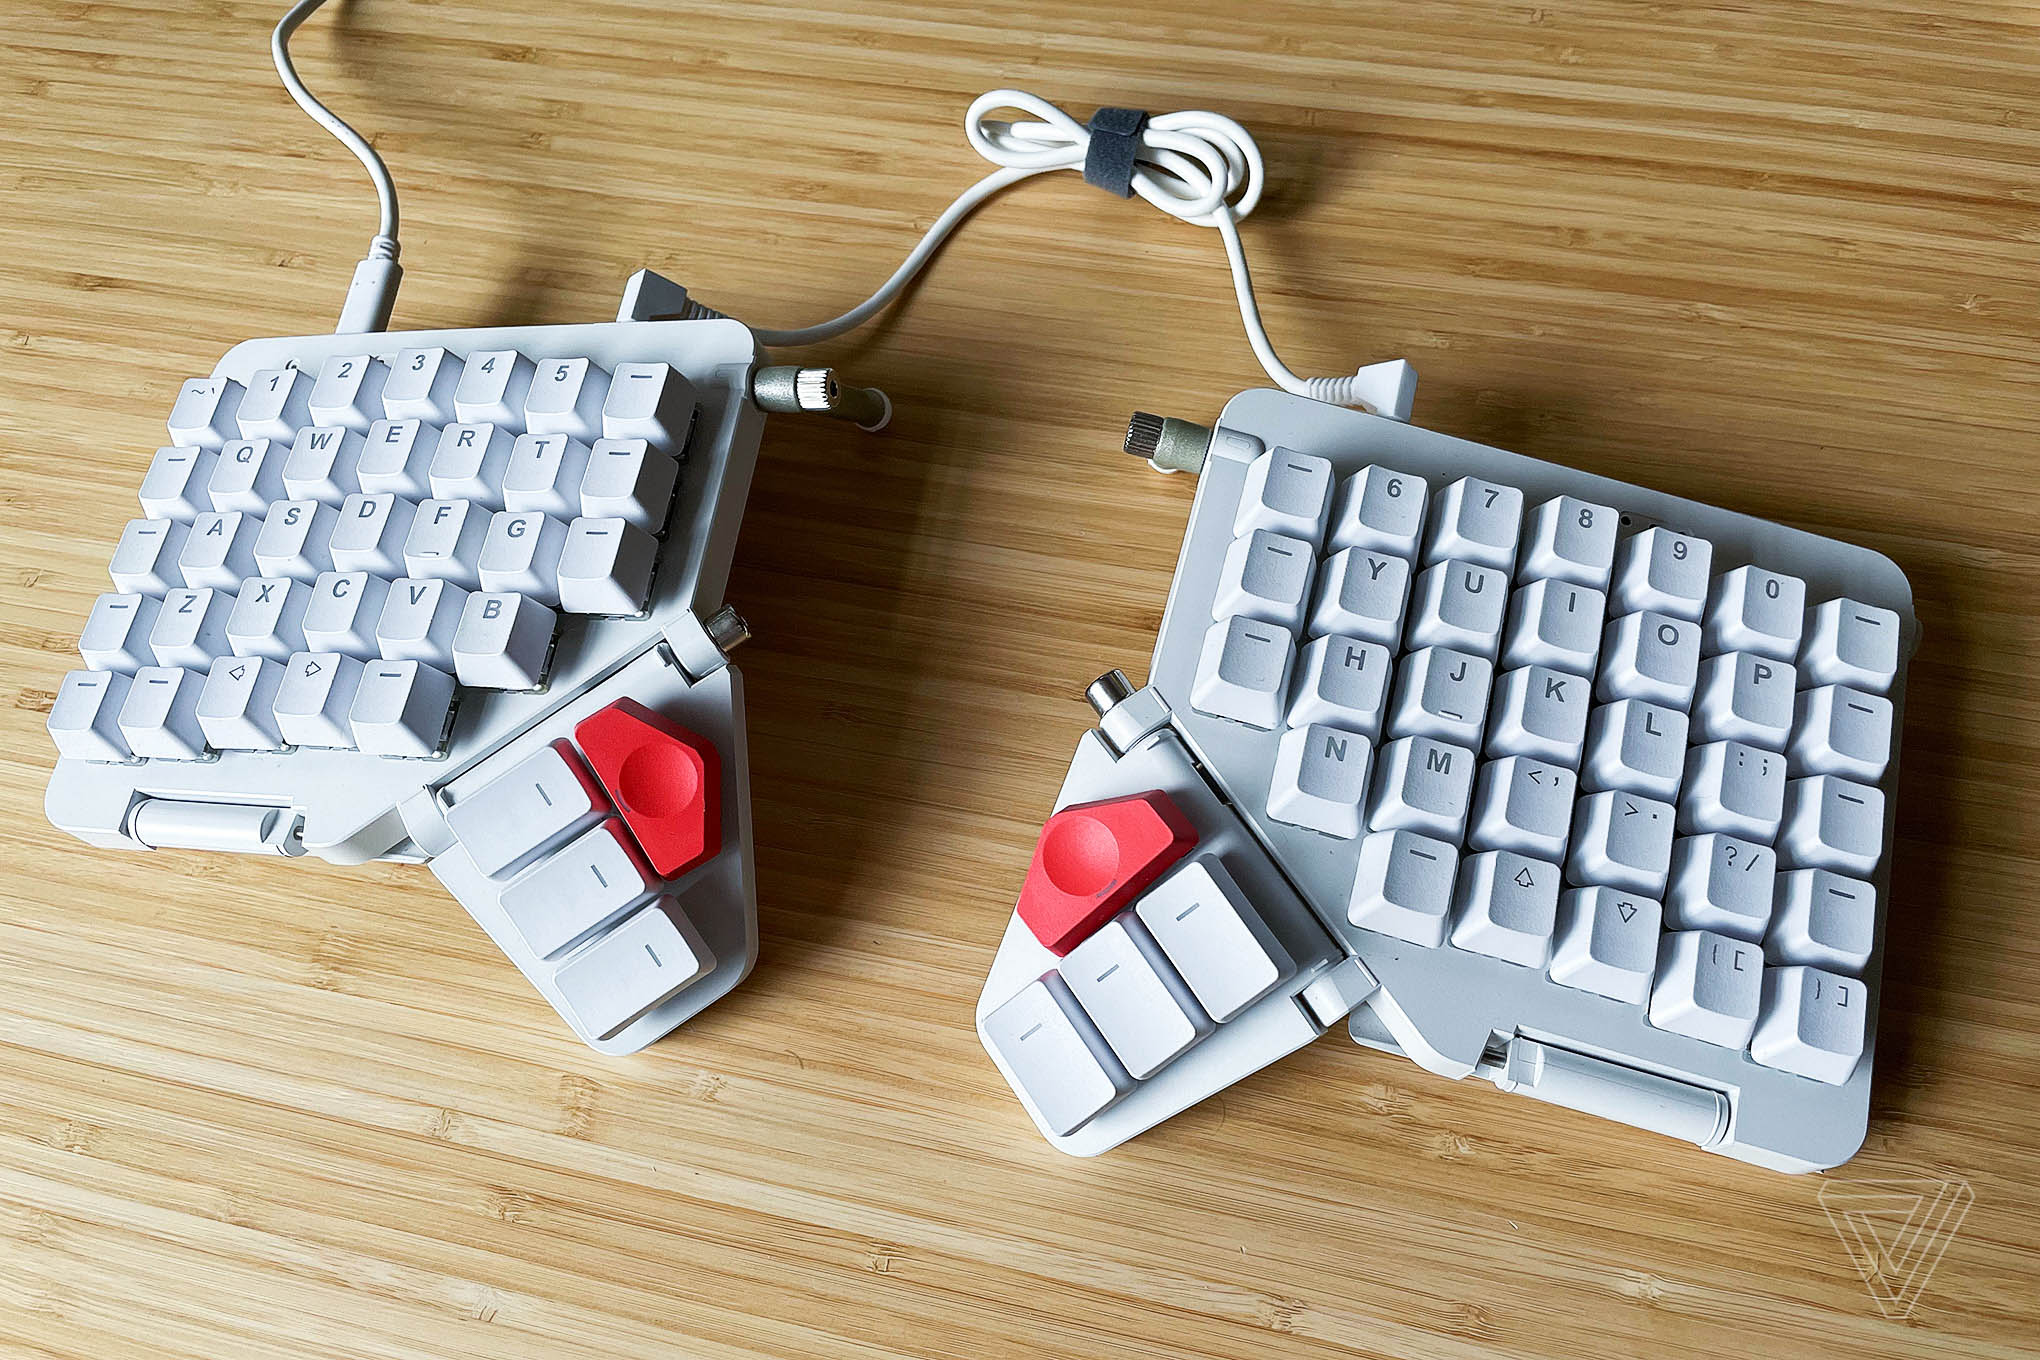 The ZSA Moonlander Mark 1 ergonomic customizable keyboard.